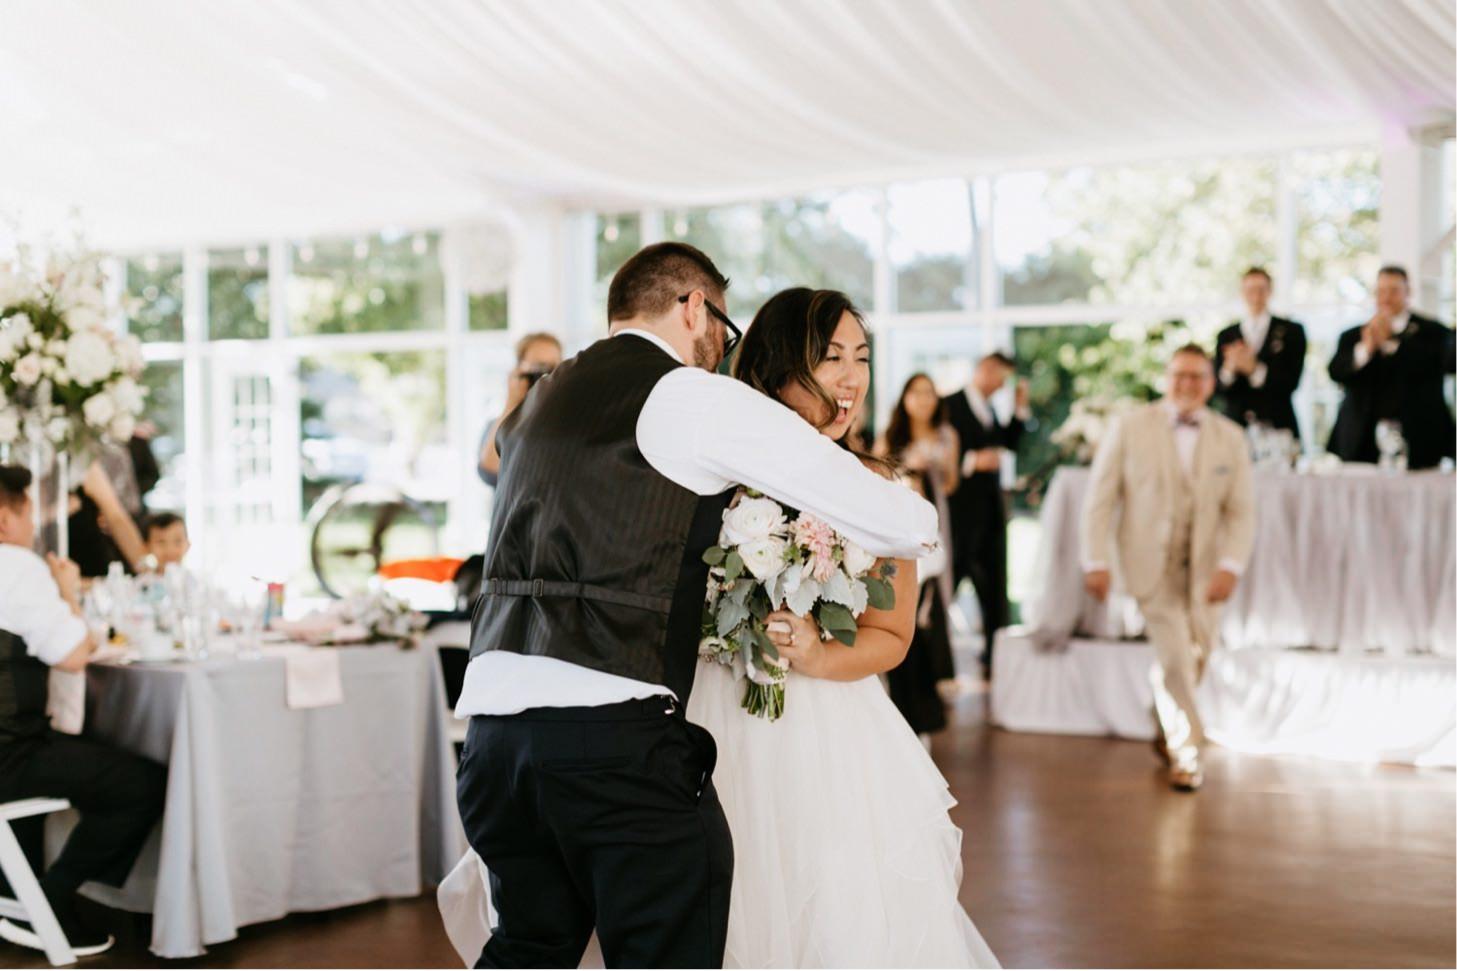 ritz-charles-wedding-reception-downtown-indianapolis-wedding-photographer026.JPG